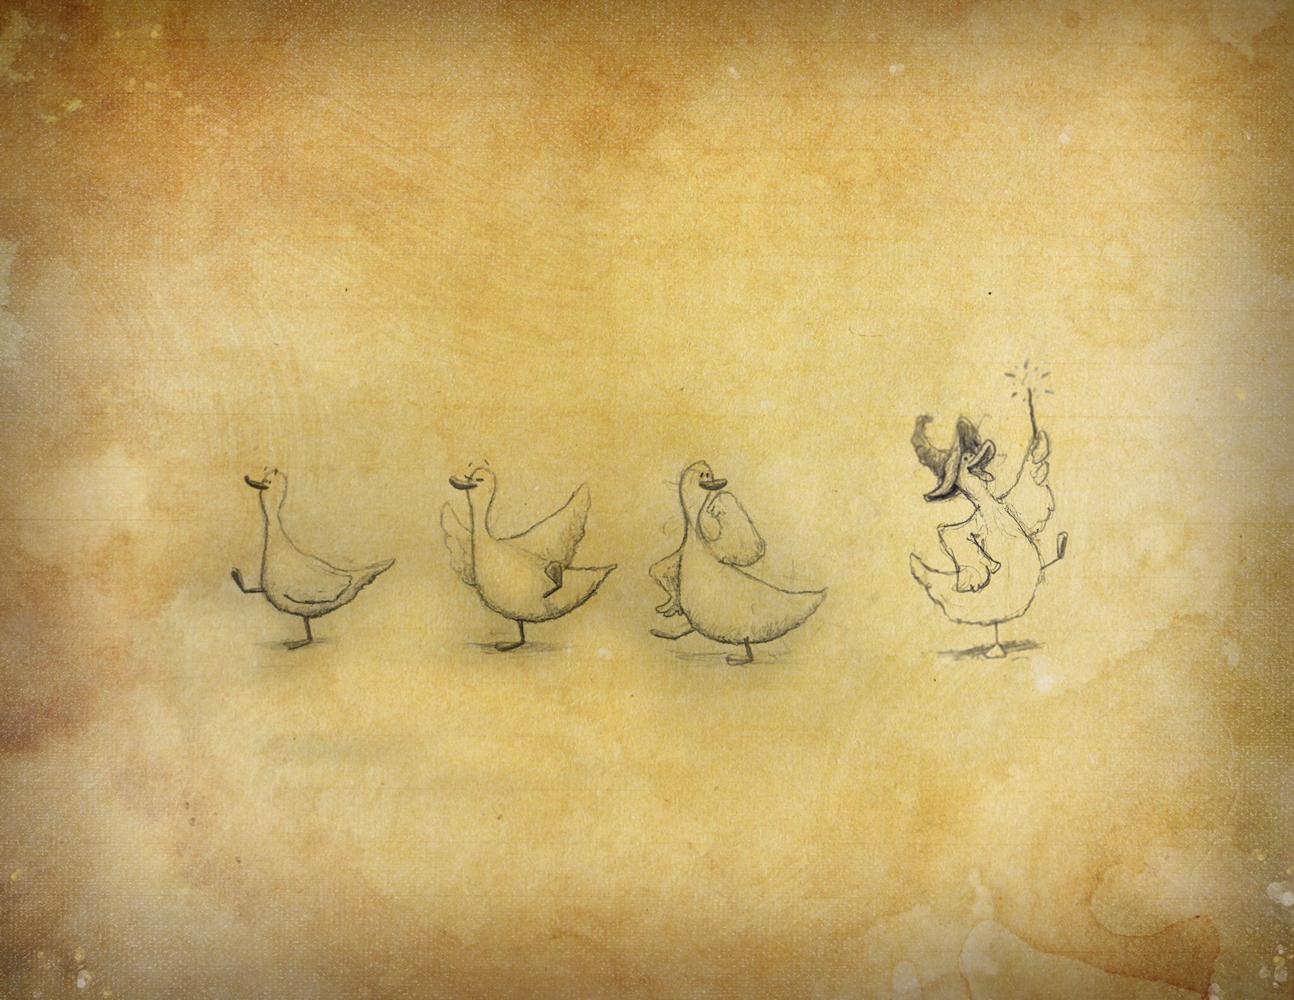 Ducks_1294x1000.jpg